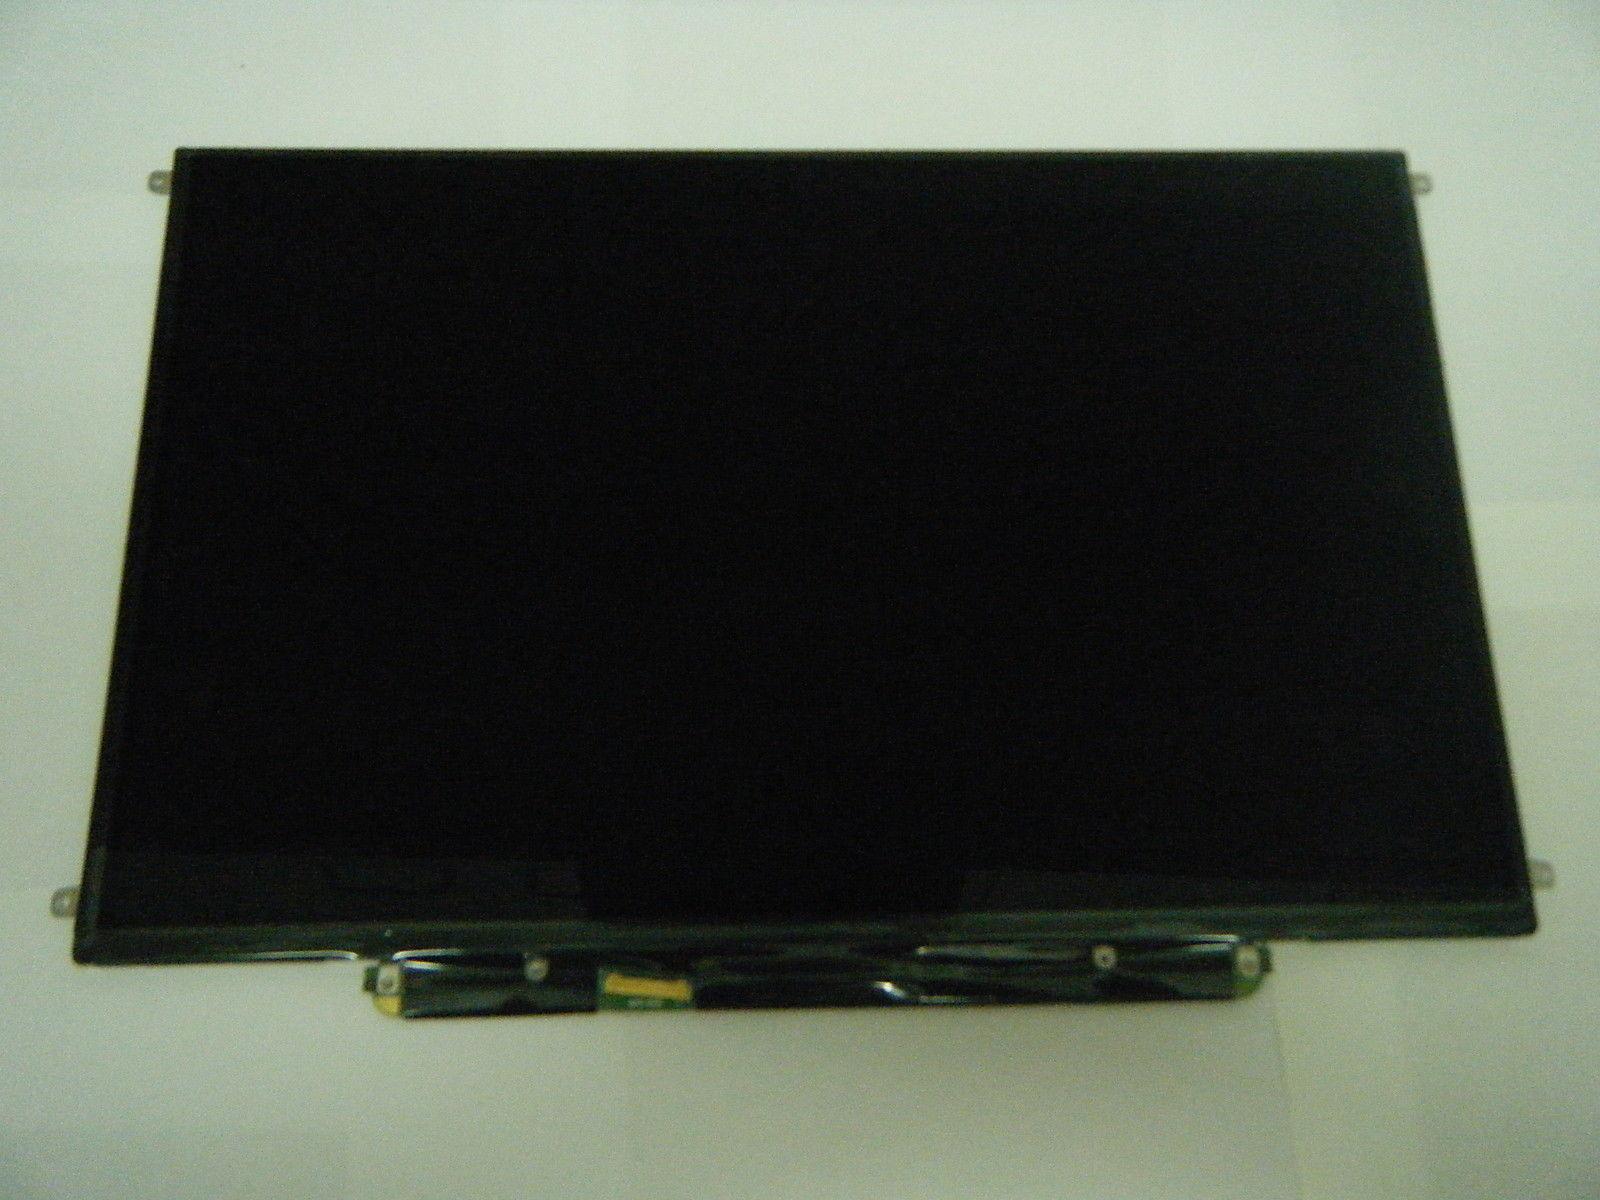 Apple-Macbook-Unibody-LED-13-3-LCD-SCREEN-LP133WX2-TLC2 Apple-Macbook-Unibody-LED-13-3-LCD-SCREEN-LP133WX2-TLC2 Apple-Macbook-Unibody-LED-13-3-LCD-SCREEN-LP133WX2-TLC2 Apple Macbook Unibody LED 13,3 LCD SCREEN LP133WX2-TLC2